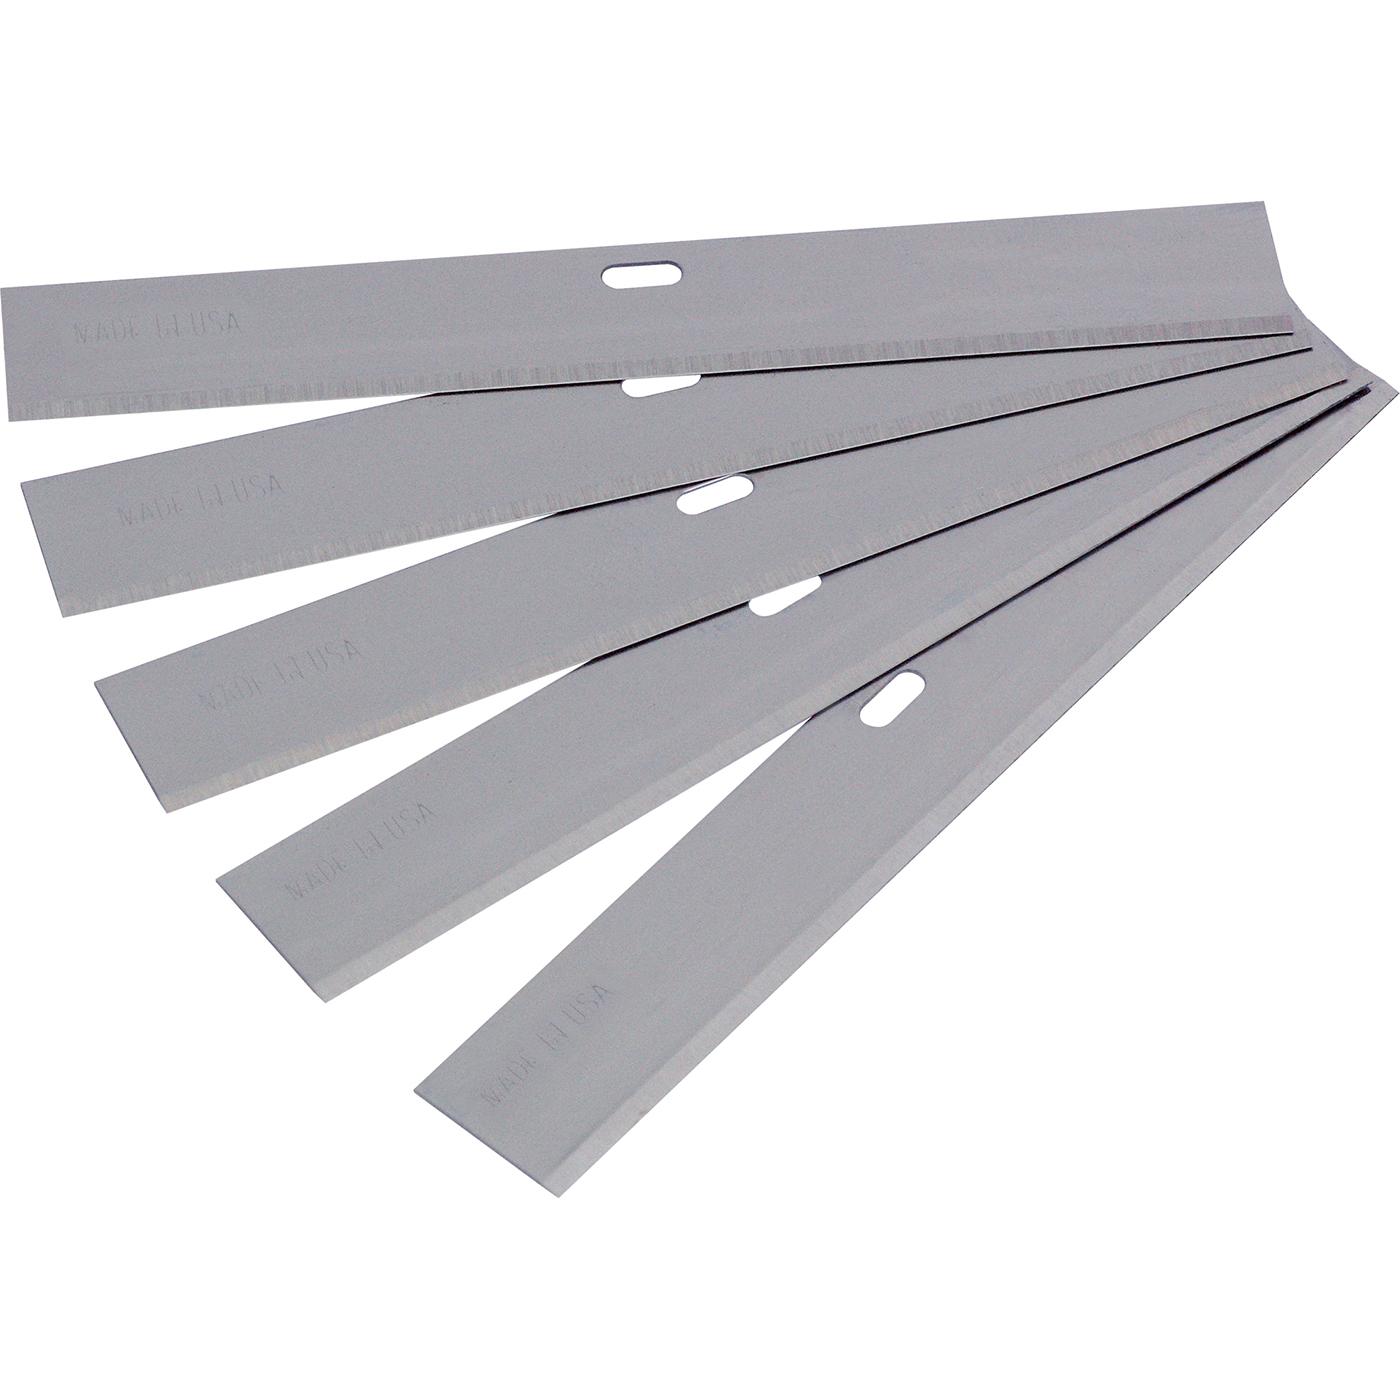 "4"" Razor Scraper Replacement Blades"